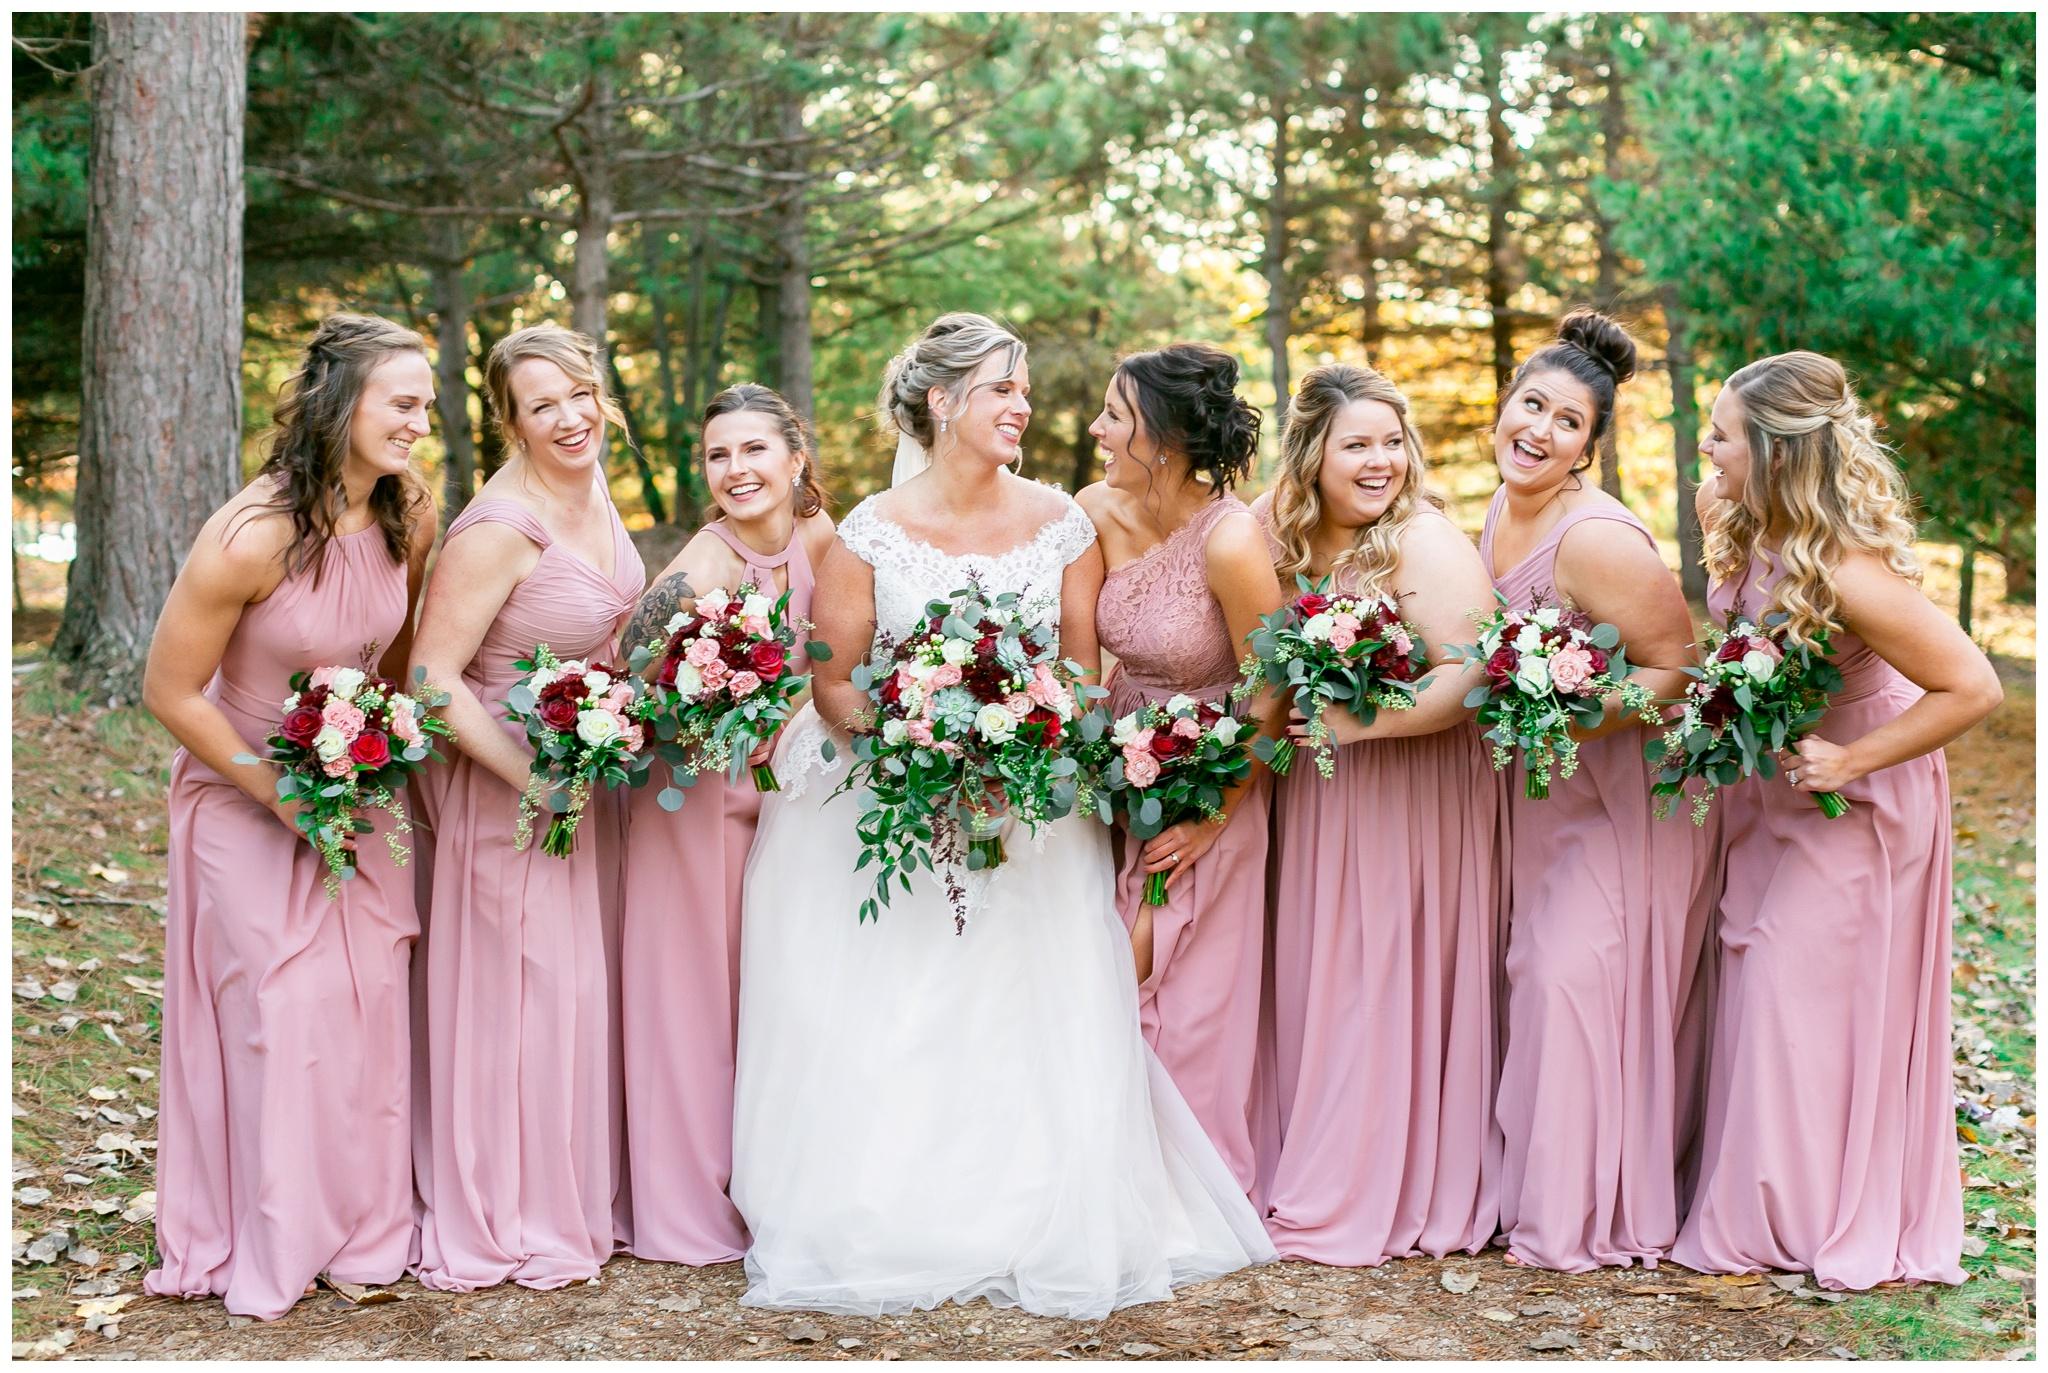 Shawano_County_park_Wedding_Caynay_Photo_Madison_Wi_2304.jpg